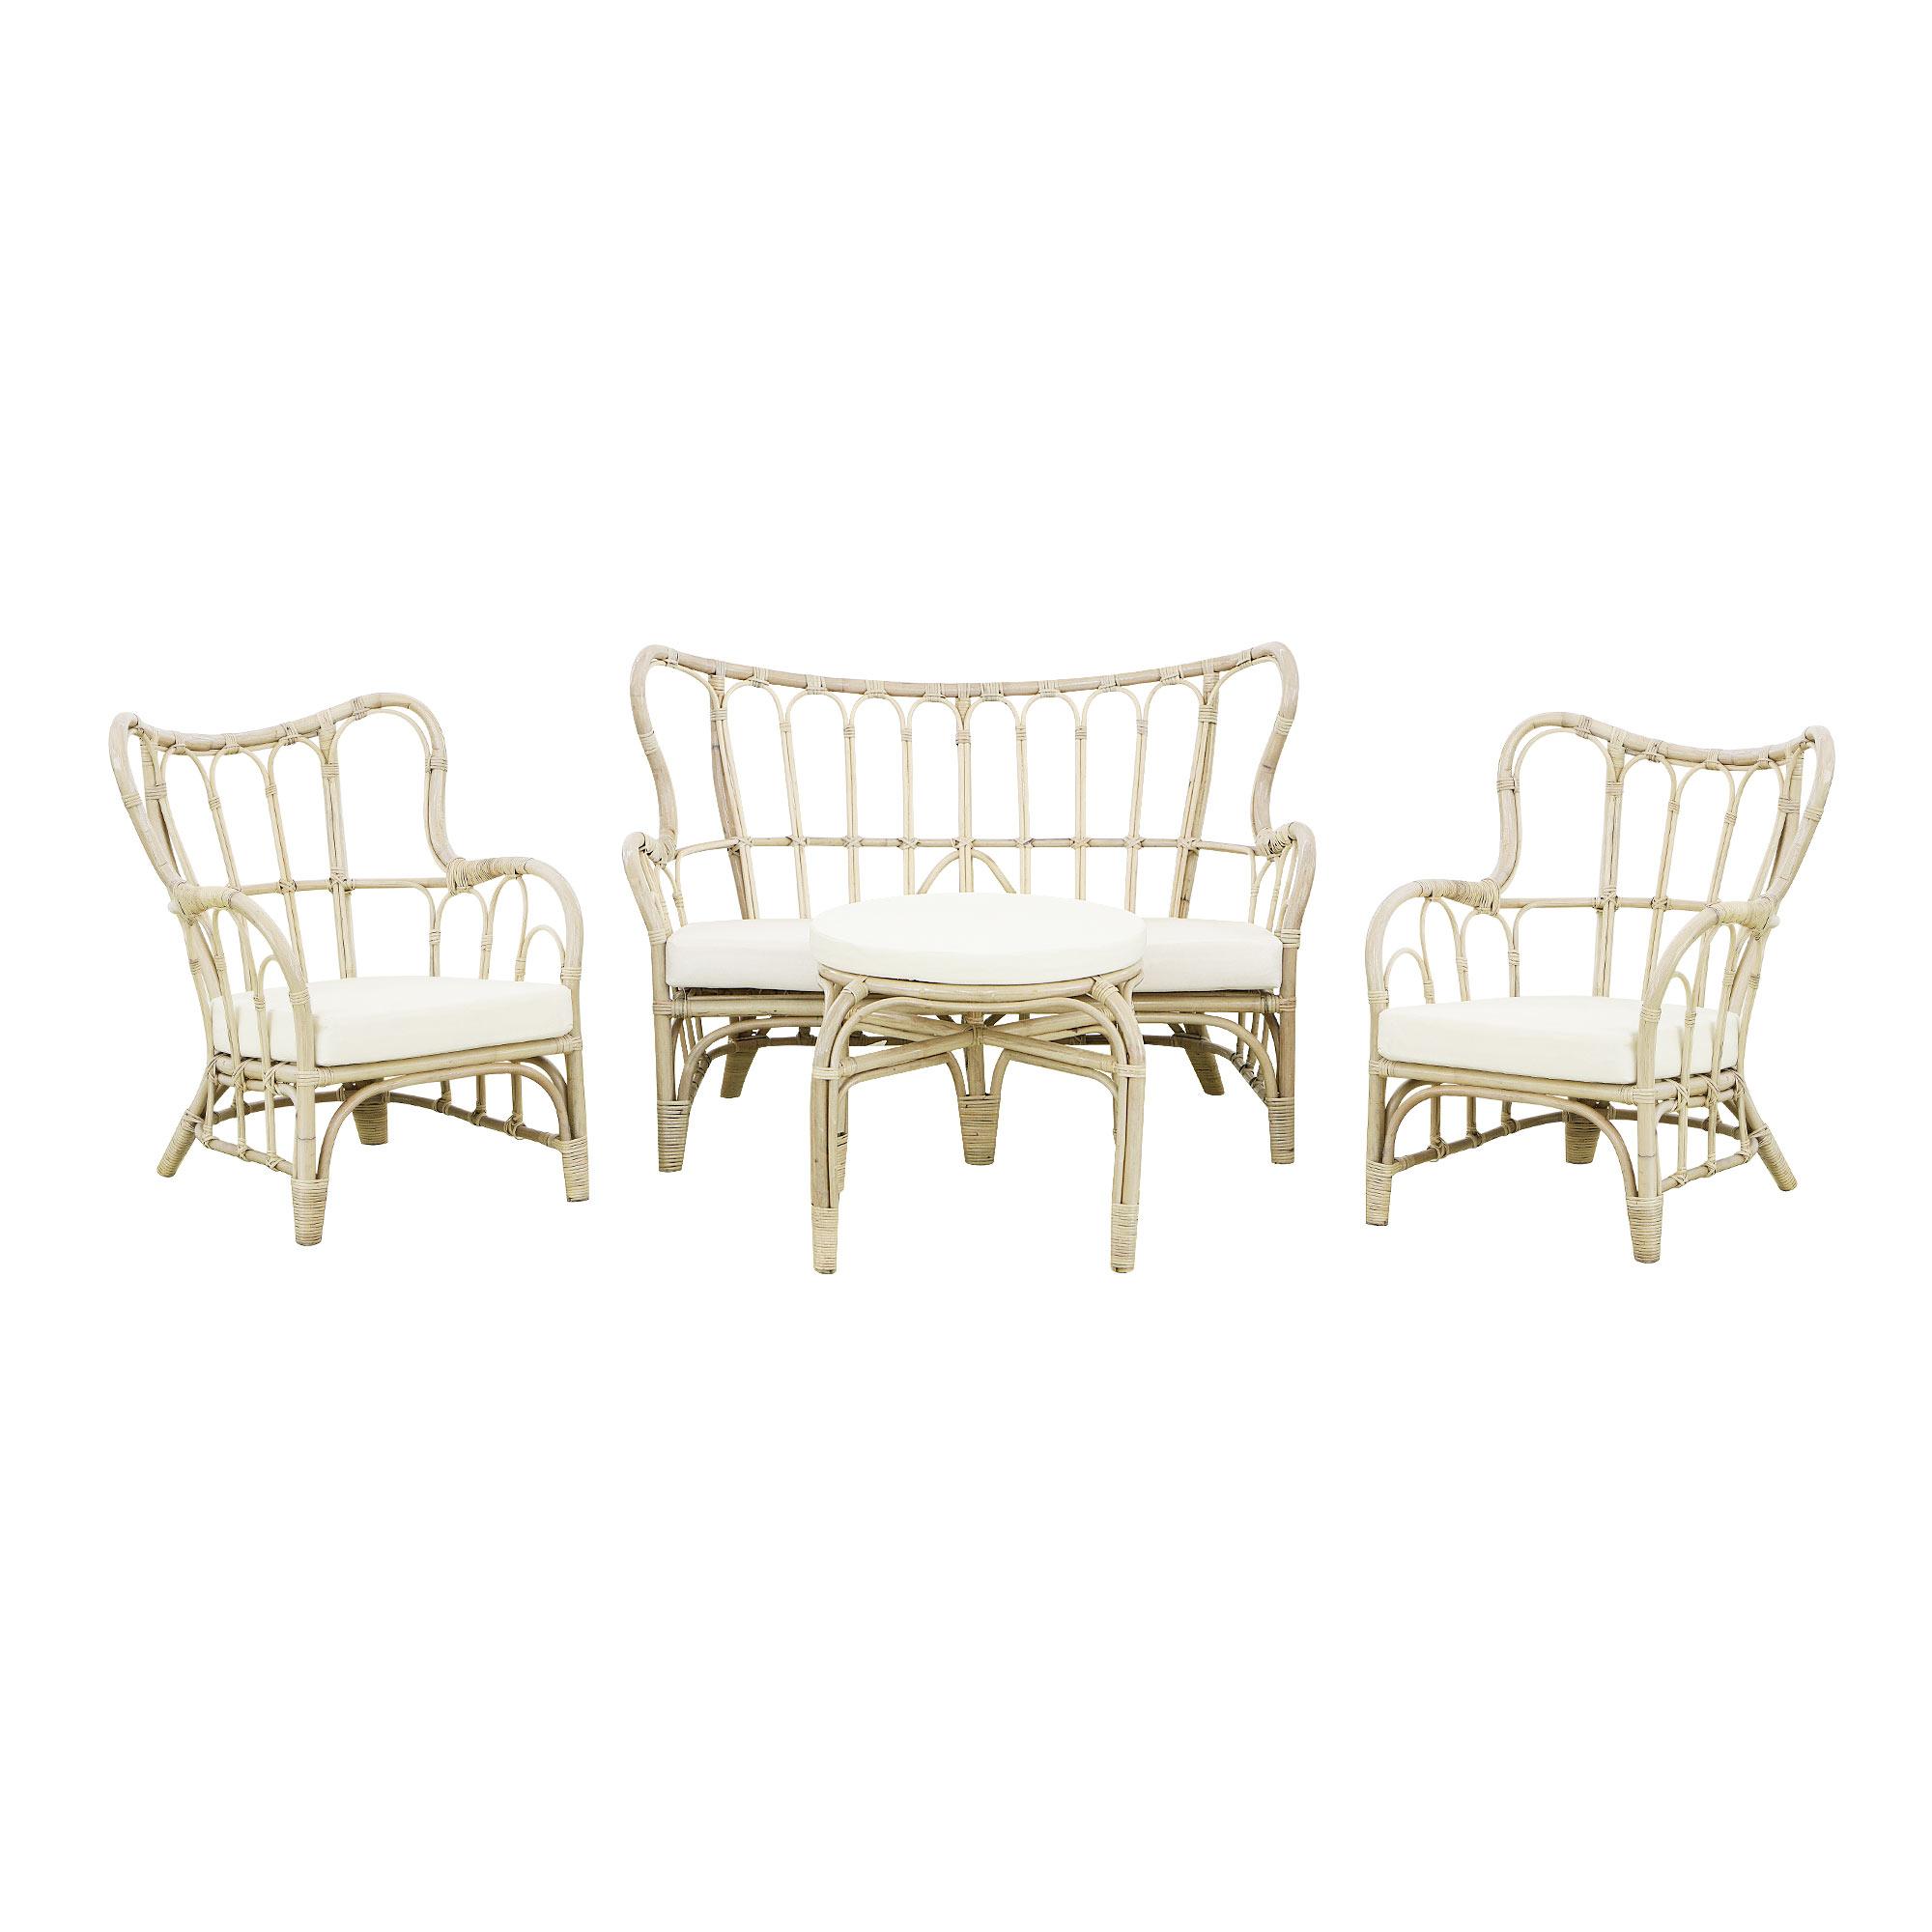 Фото - Комплект садовой мебели Rattan grand wash white 4 предмета комплект садовой мебели бел мебельторг набор мебели сан ремо мини